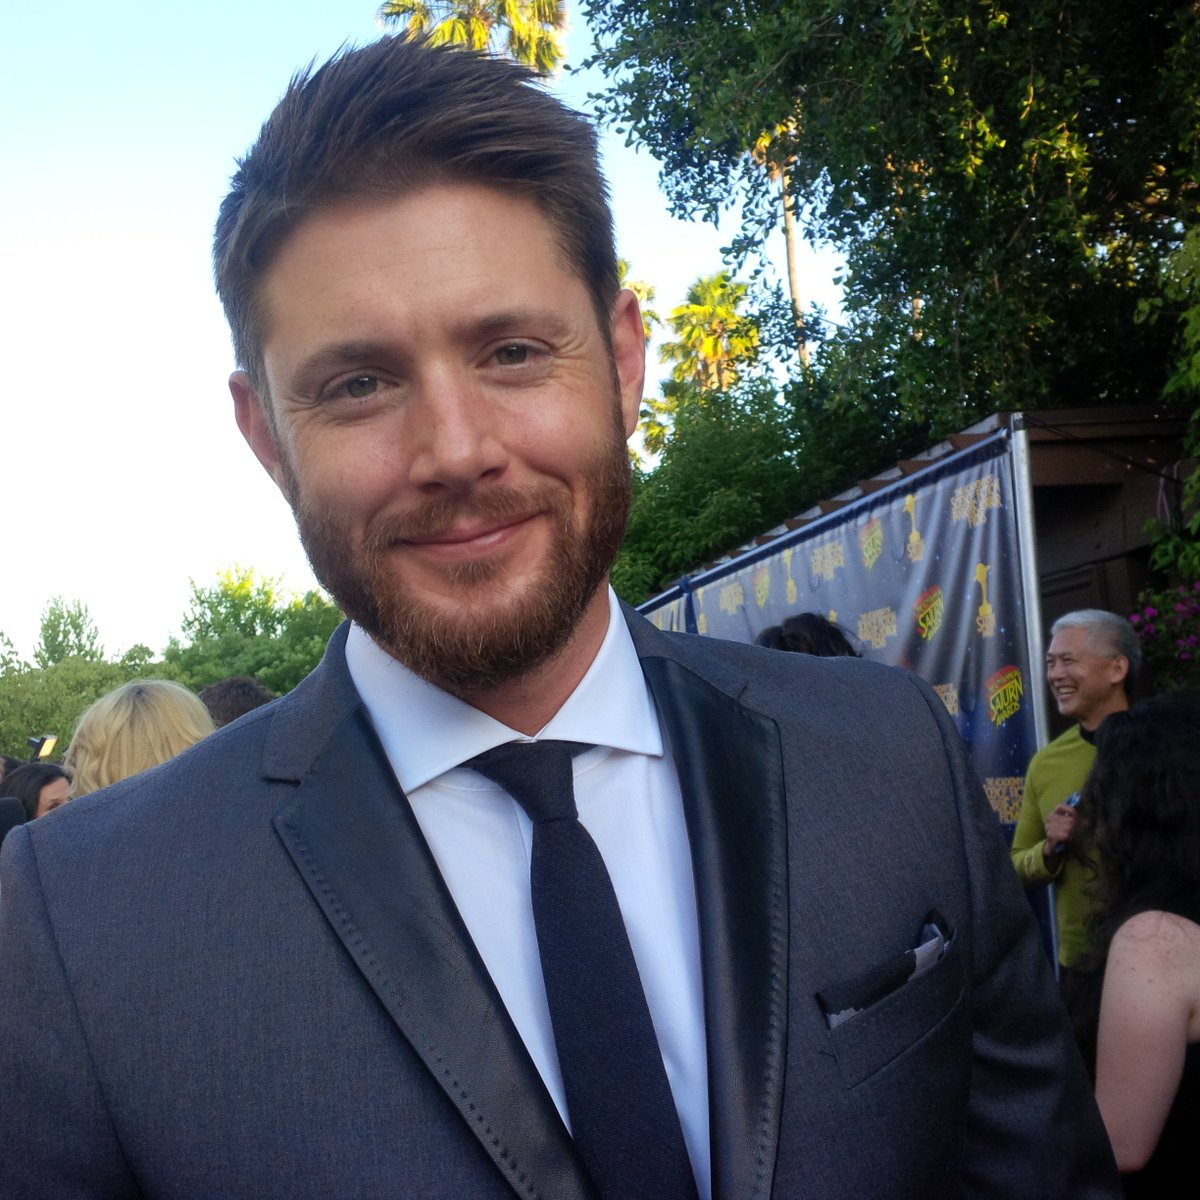 Had a very #Supernatural evening with @therealKripke  @JensenAckles @jarpad on Saturn Awards carpet. https://t.co/pOFyXvd0HL